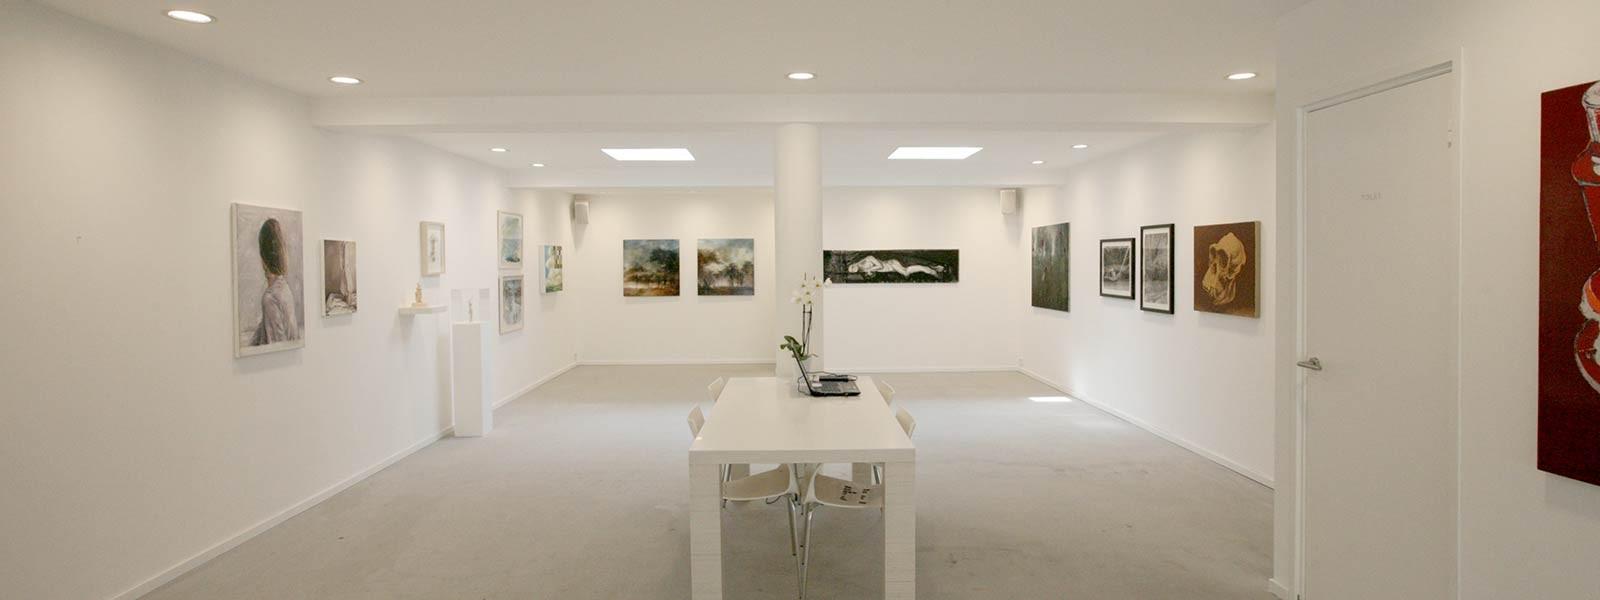 Galerie Wilms, Venlo